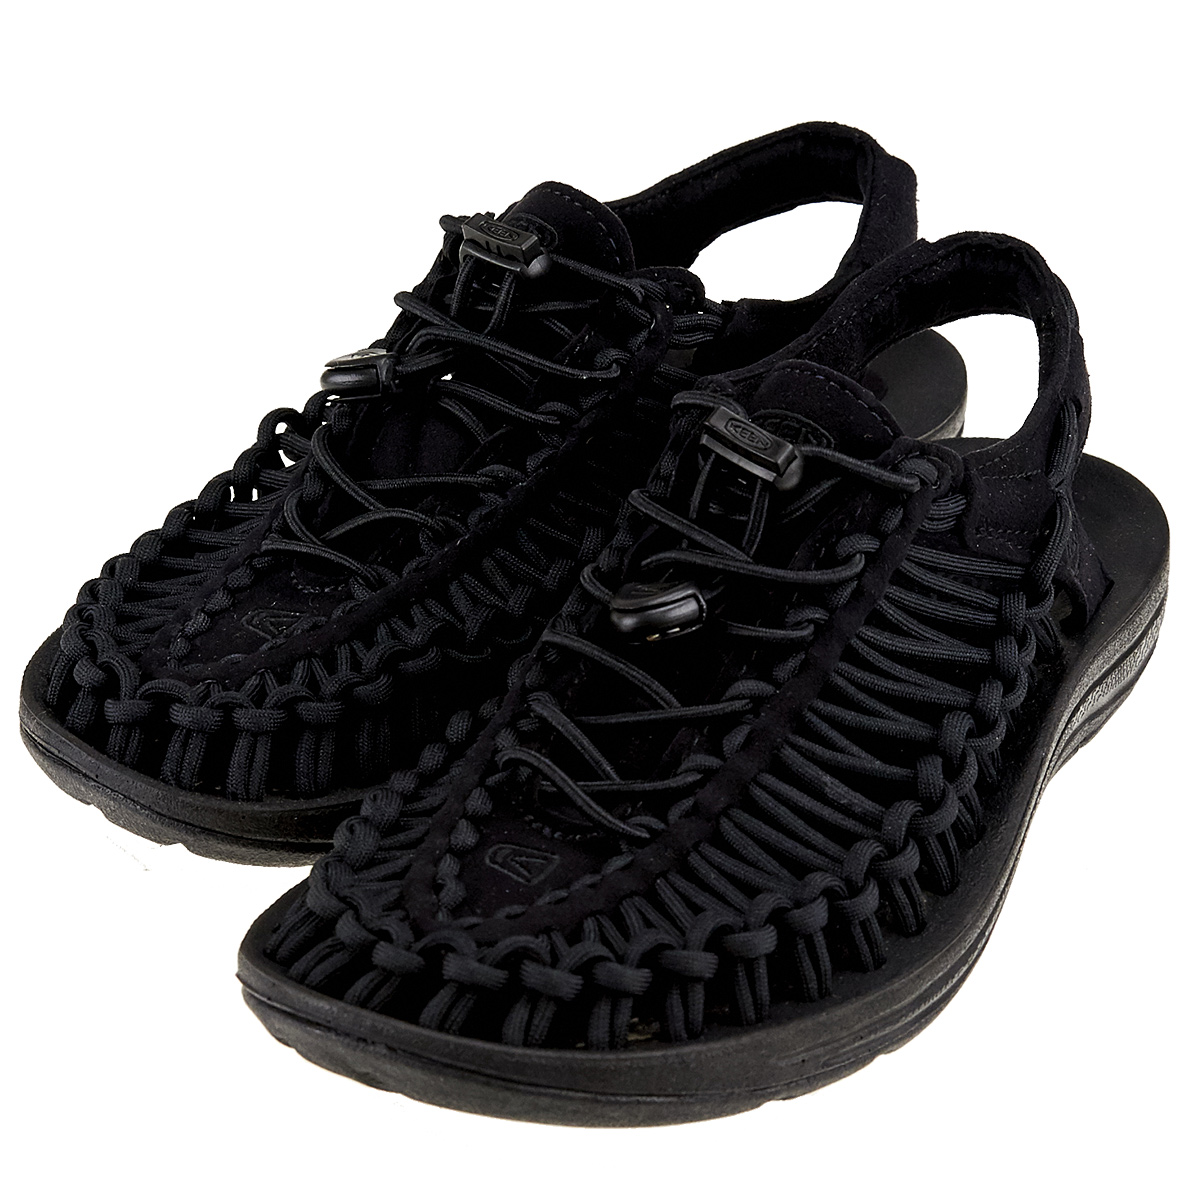 KEEN キーン レディースサンダル カジュアル 次世代スニーカー ブラック 黒 KN-UNEEK BL/BL